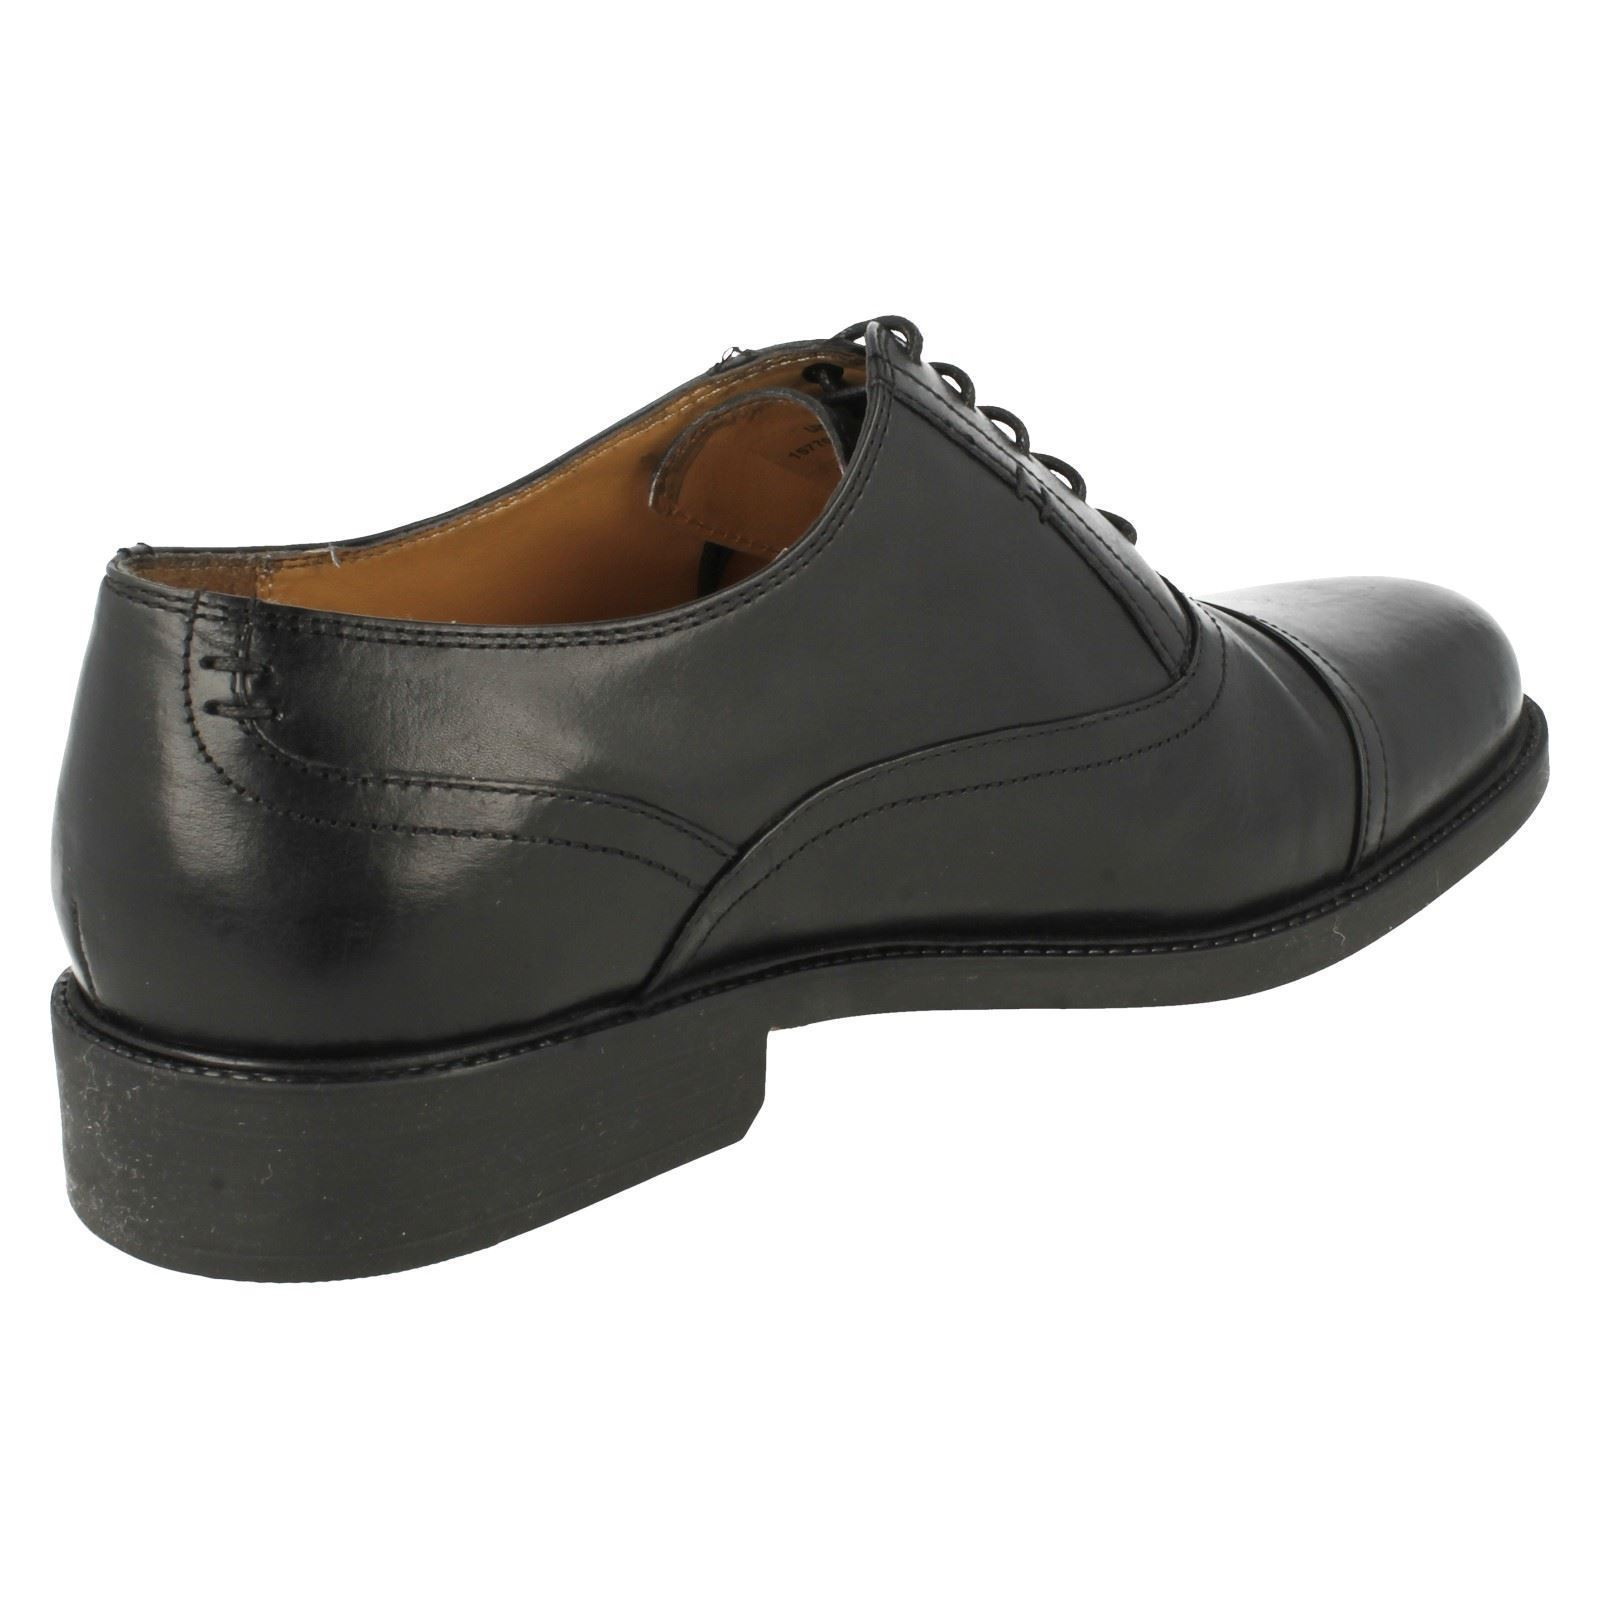 Hombre Clarks Formal Formal Formal Zapatos, Bezel Beat -w 1d76bf